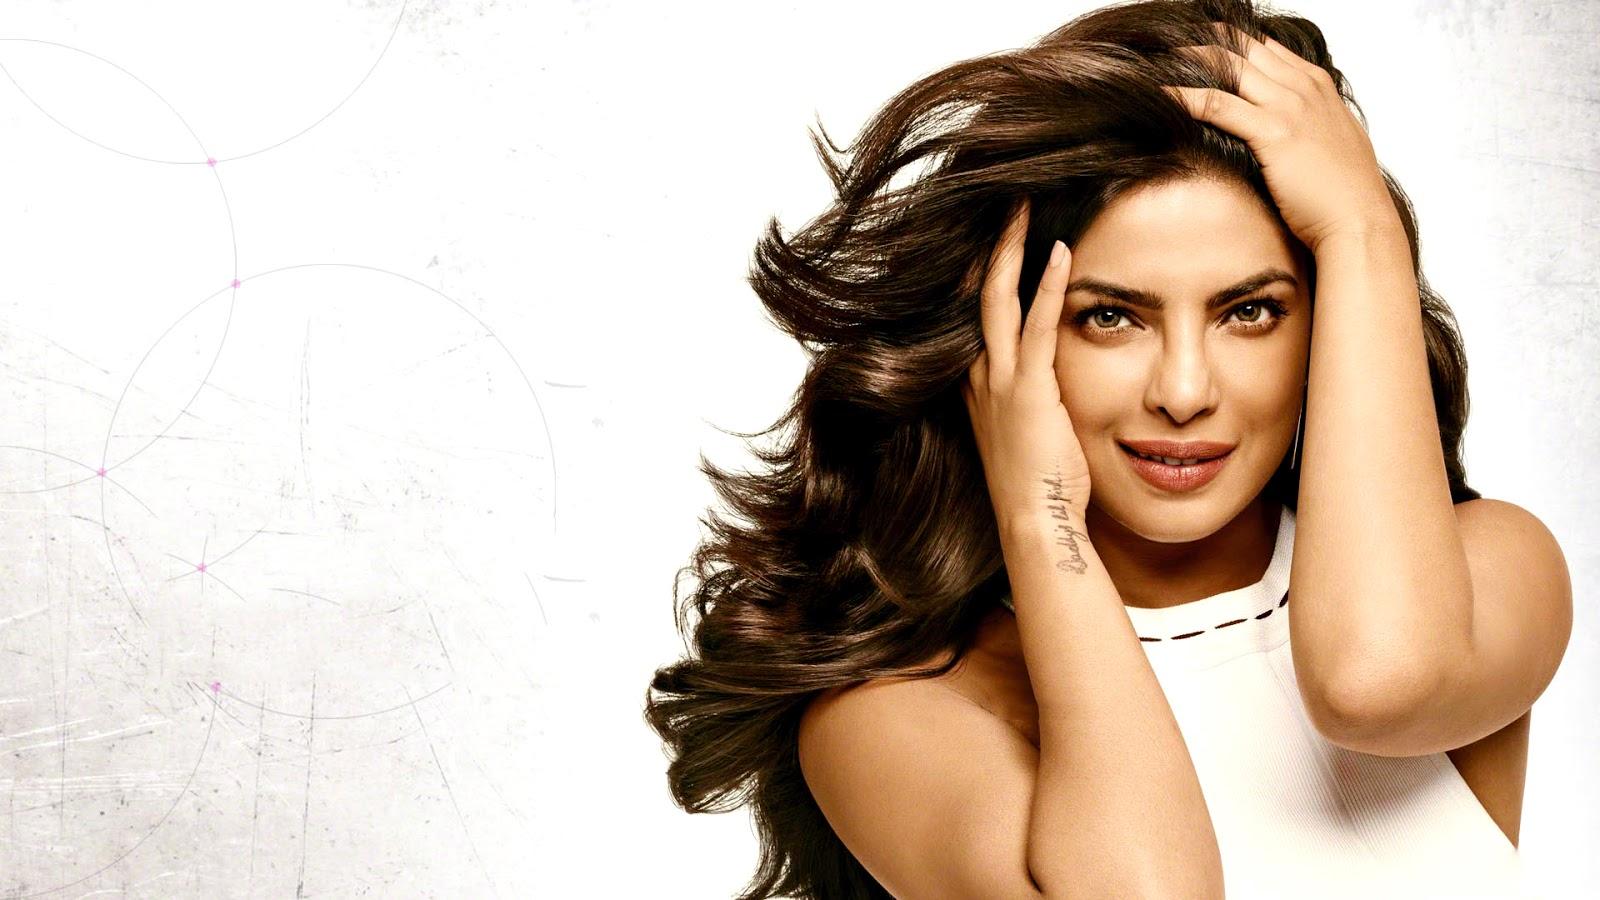 Download Bollywood Actress Hd Wallpapers 1080p Free: Priyanka Chopra Wallpapers HD Download Free 1080p